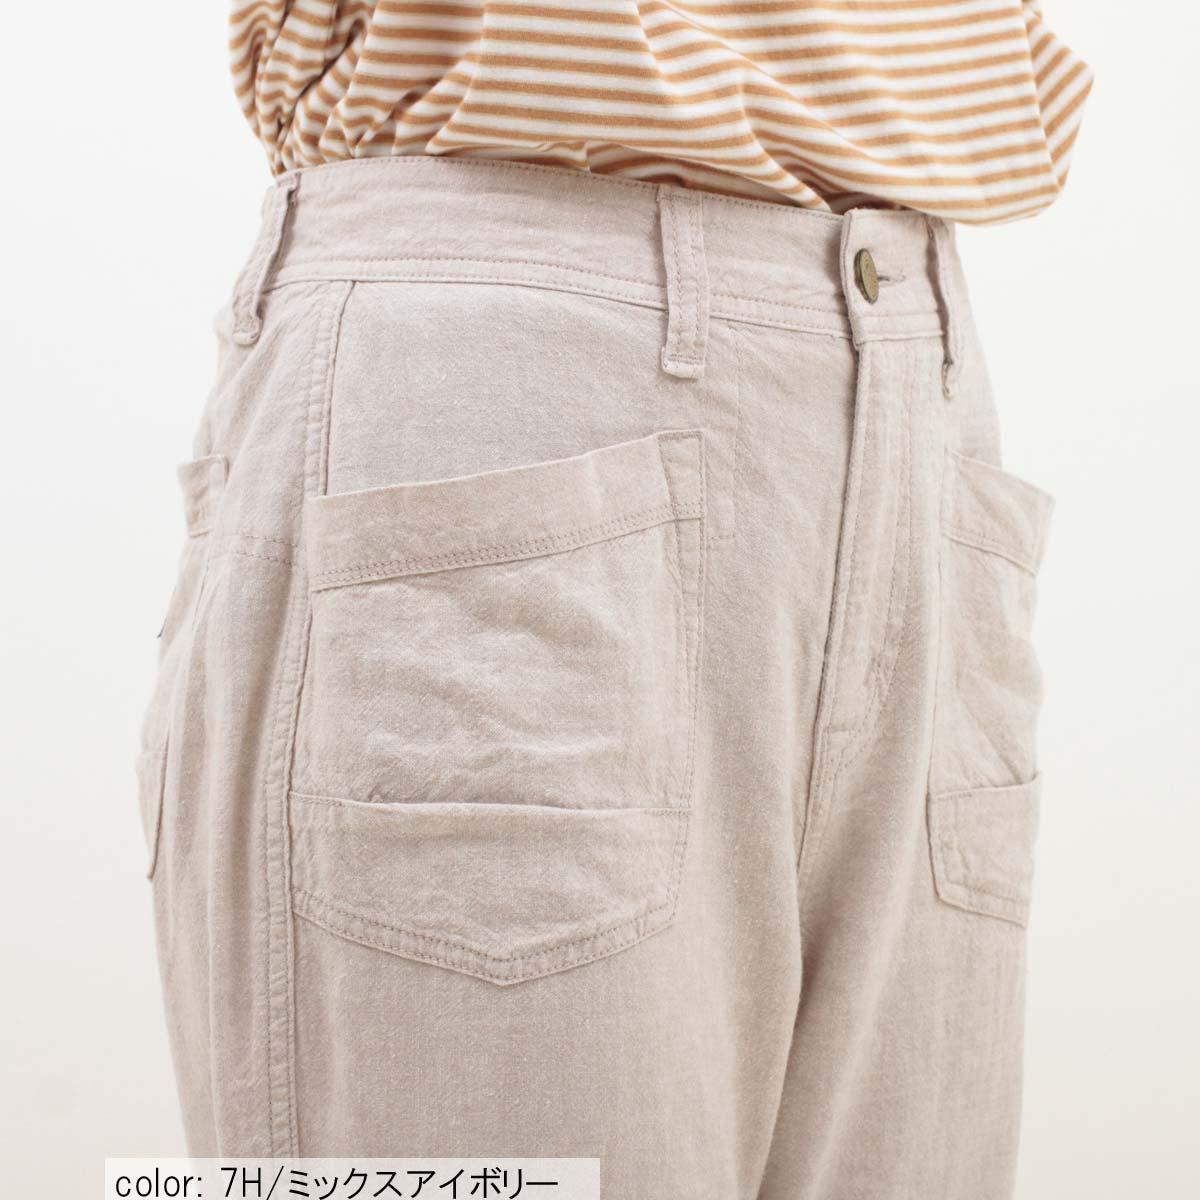 【PRE SALE】Cafetty リラックステーパード CF0399